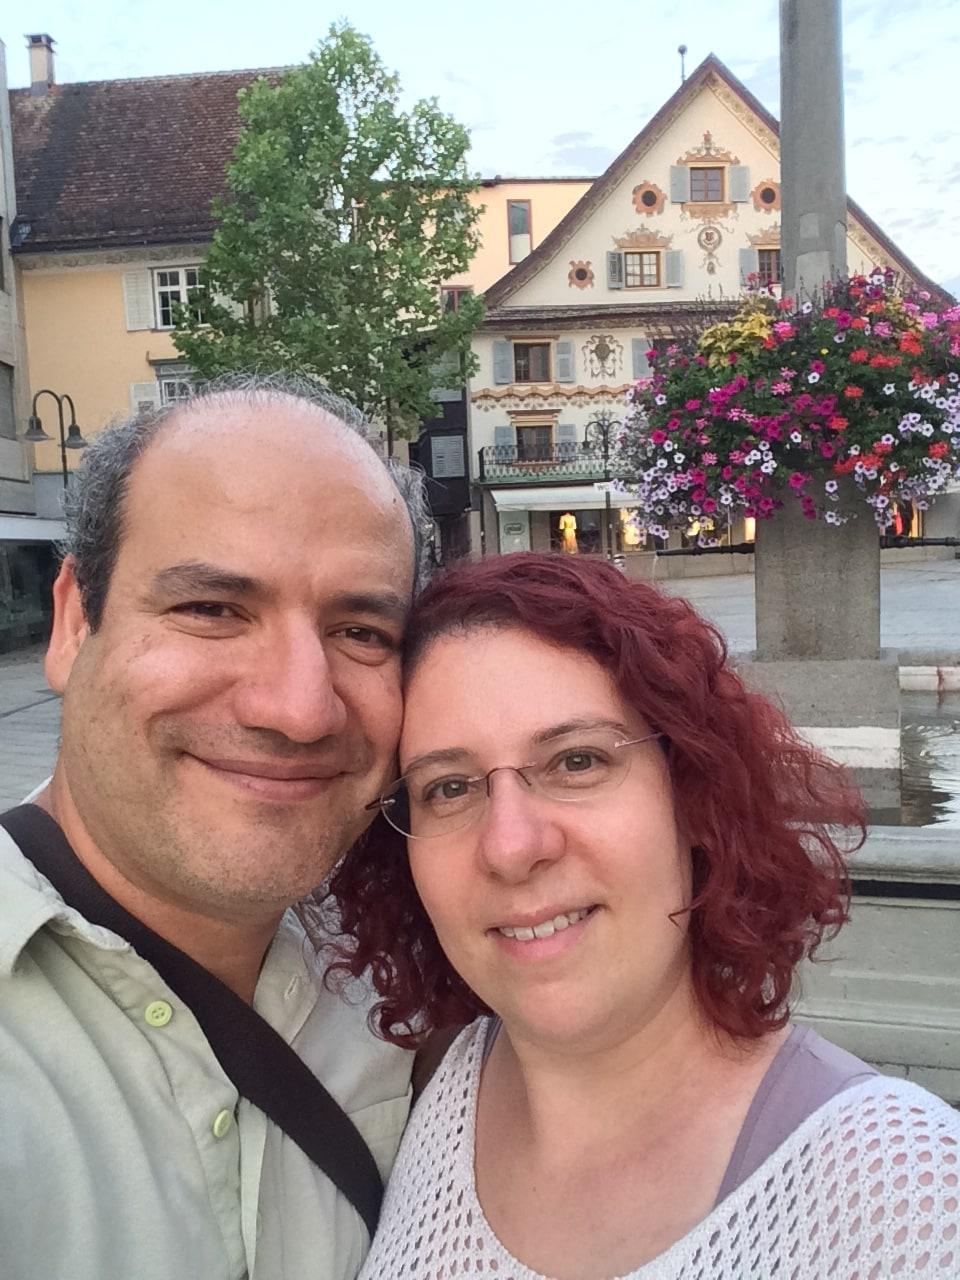 Edna & Joel from Dübendorf